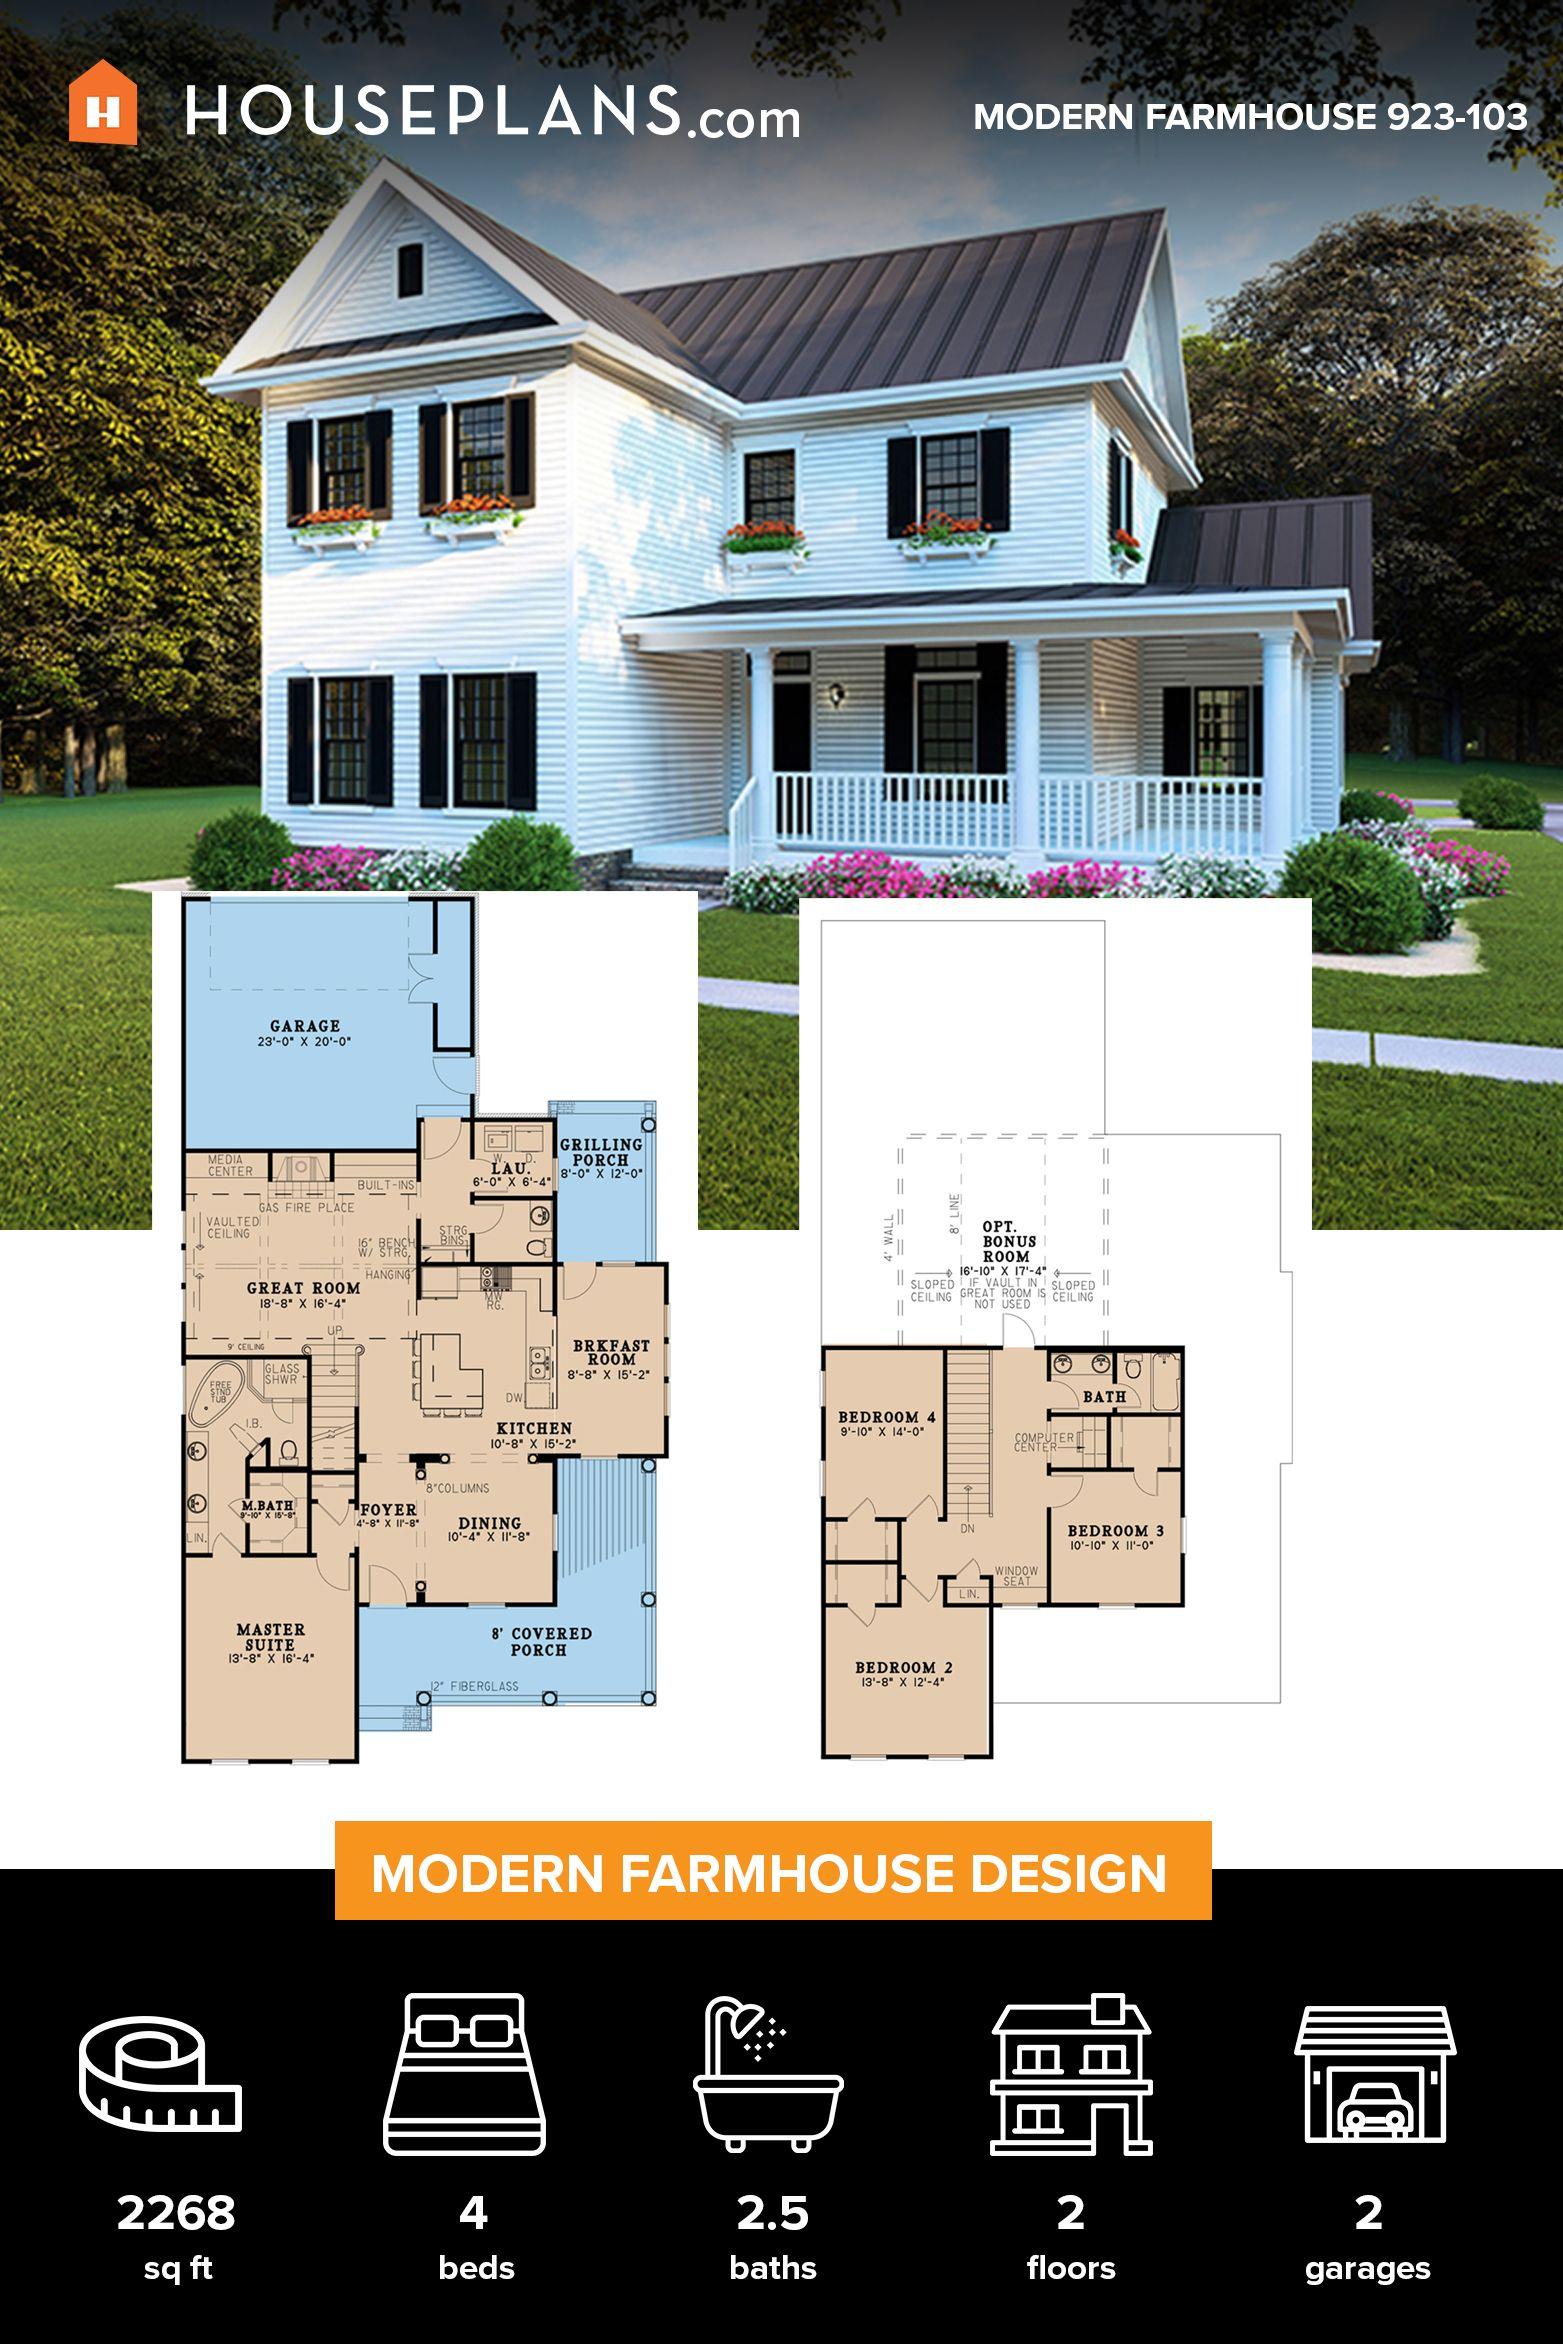 Farmhouse Style House Plan 4 Beds 2 5 Baths 2268 Sq Ft Plan 923 103 Modern Farmhouse Plans Farmhouse Style House Plans Farmhouse Plans